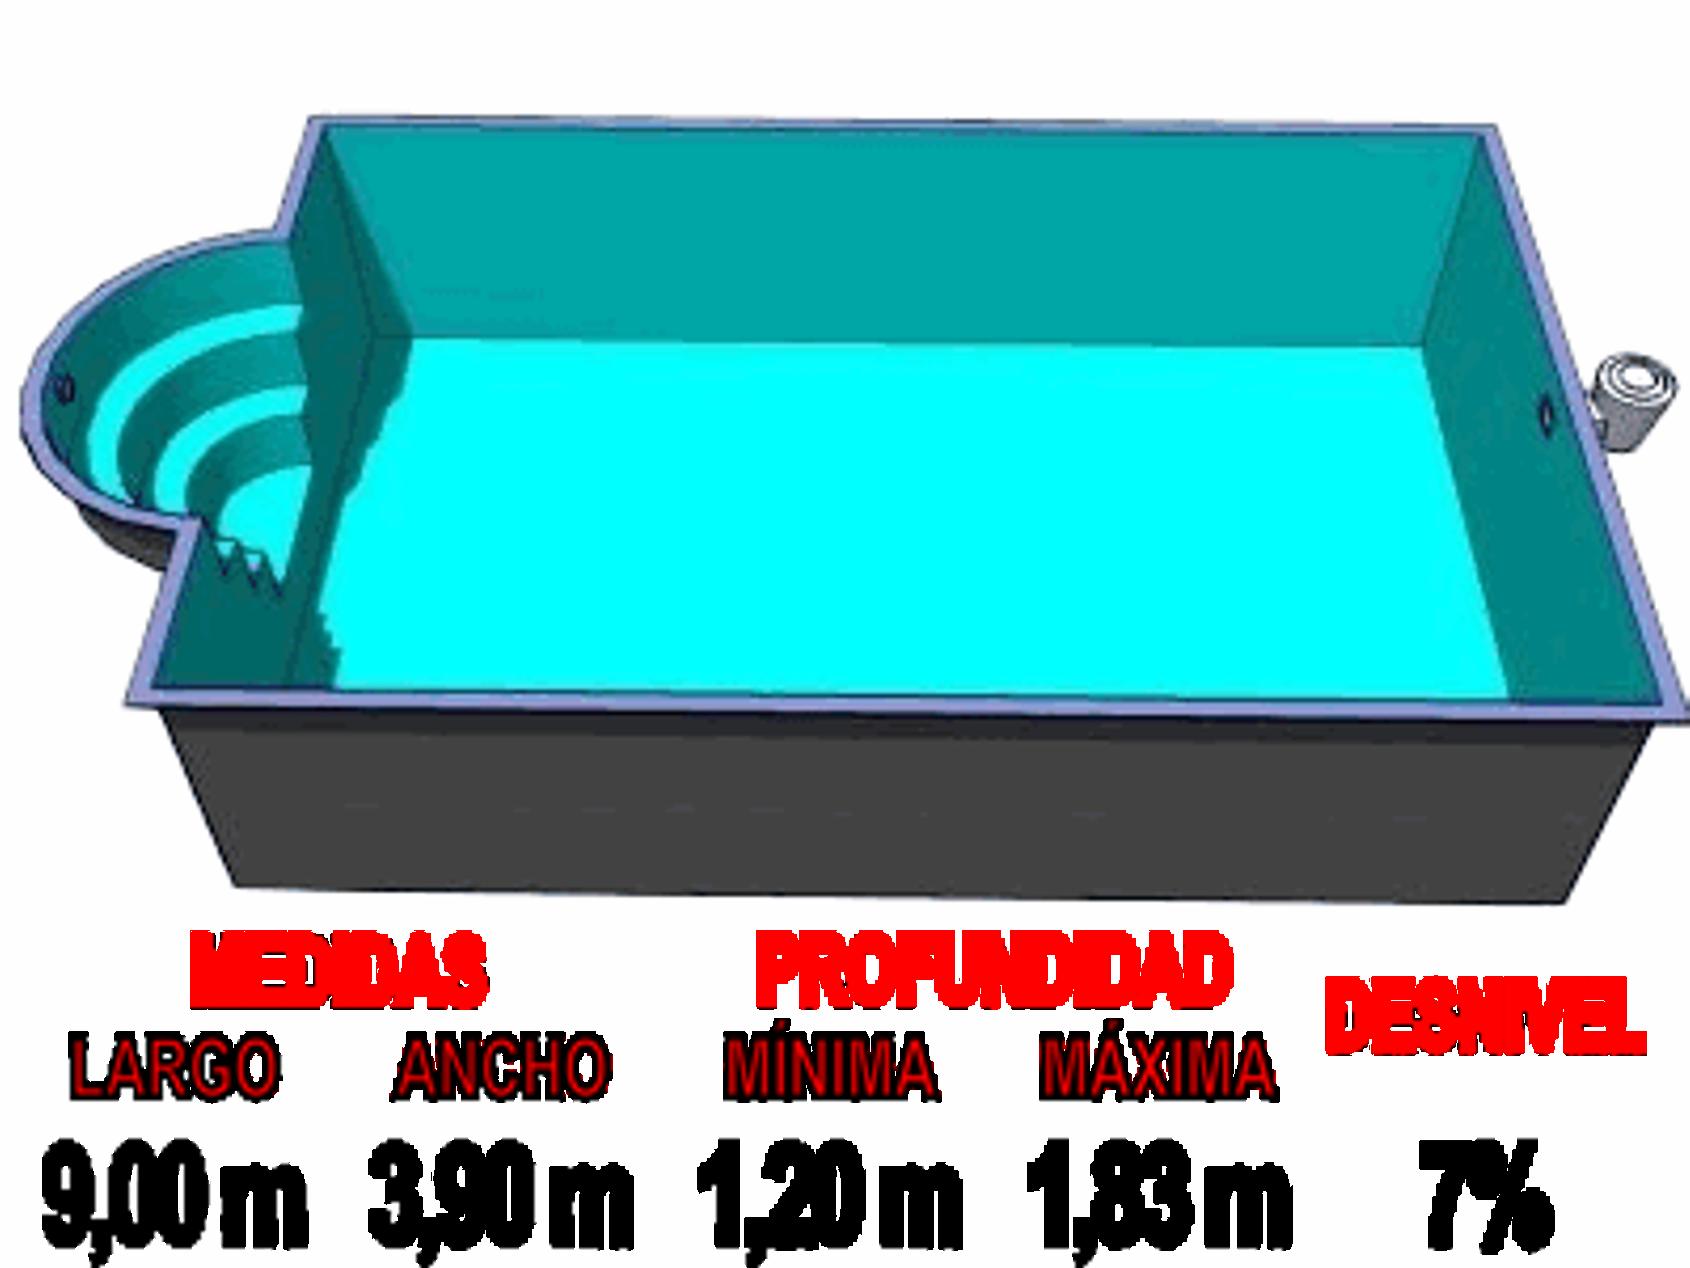 Barpool piscinas prefabricadas de poliester reforzadas for Medidas de piscinas